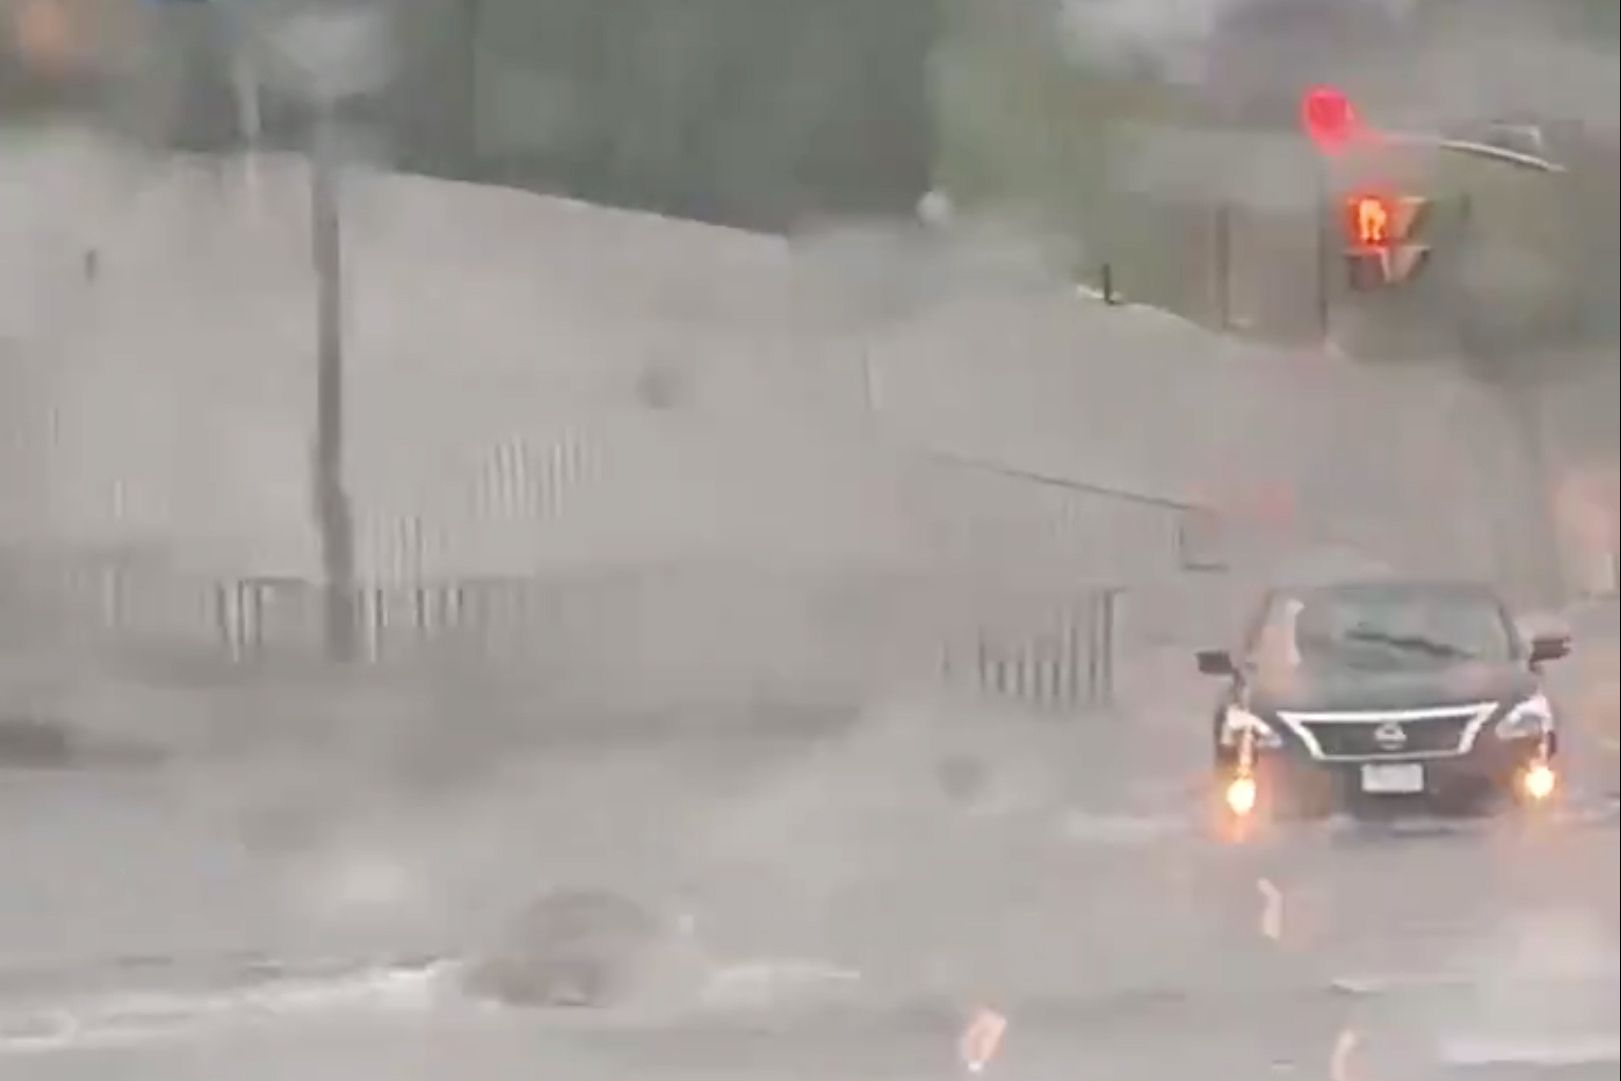 Heavy rains bring flash floods to Toronto area - The Globe